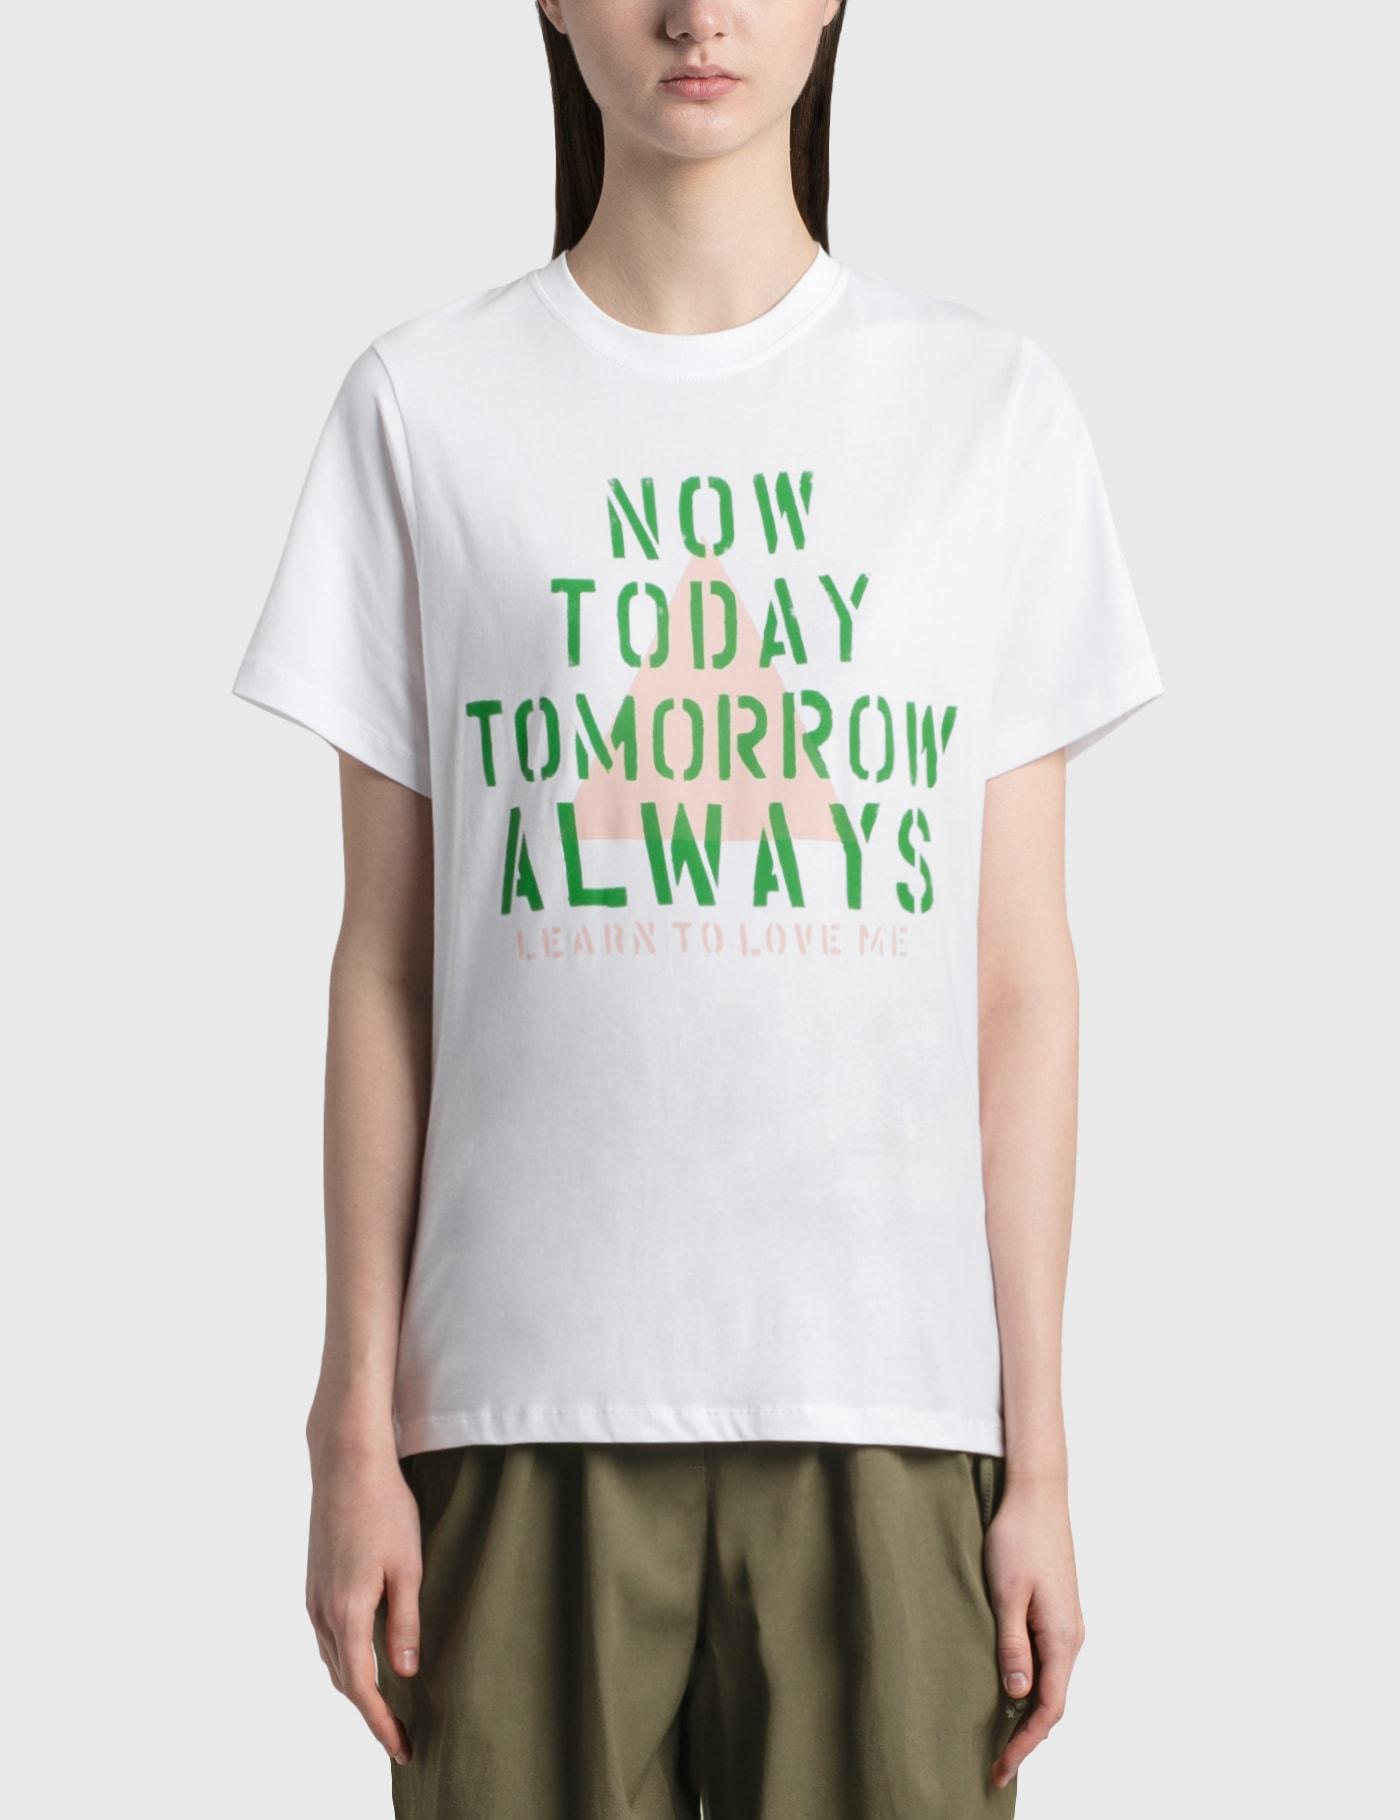 Coperni Coperni x Marc Hundley T-Shirt